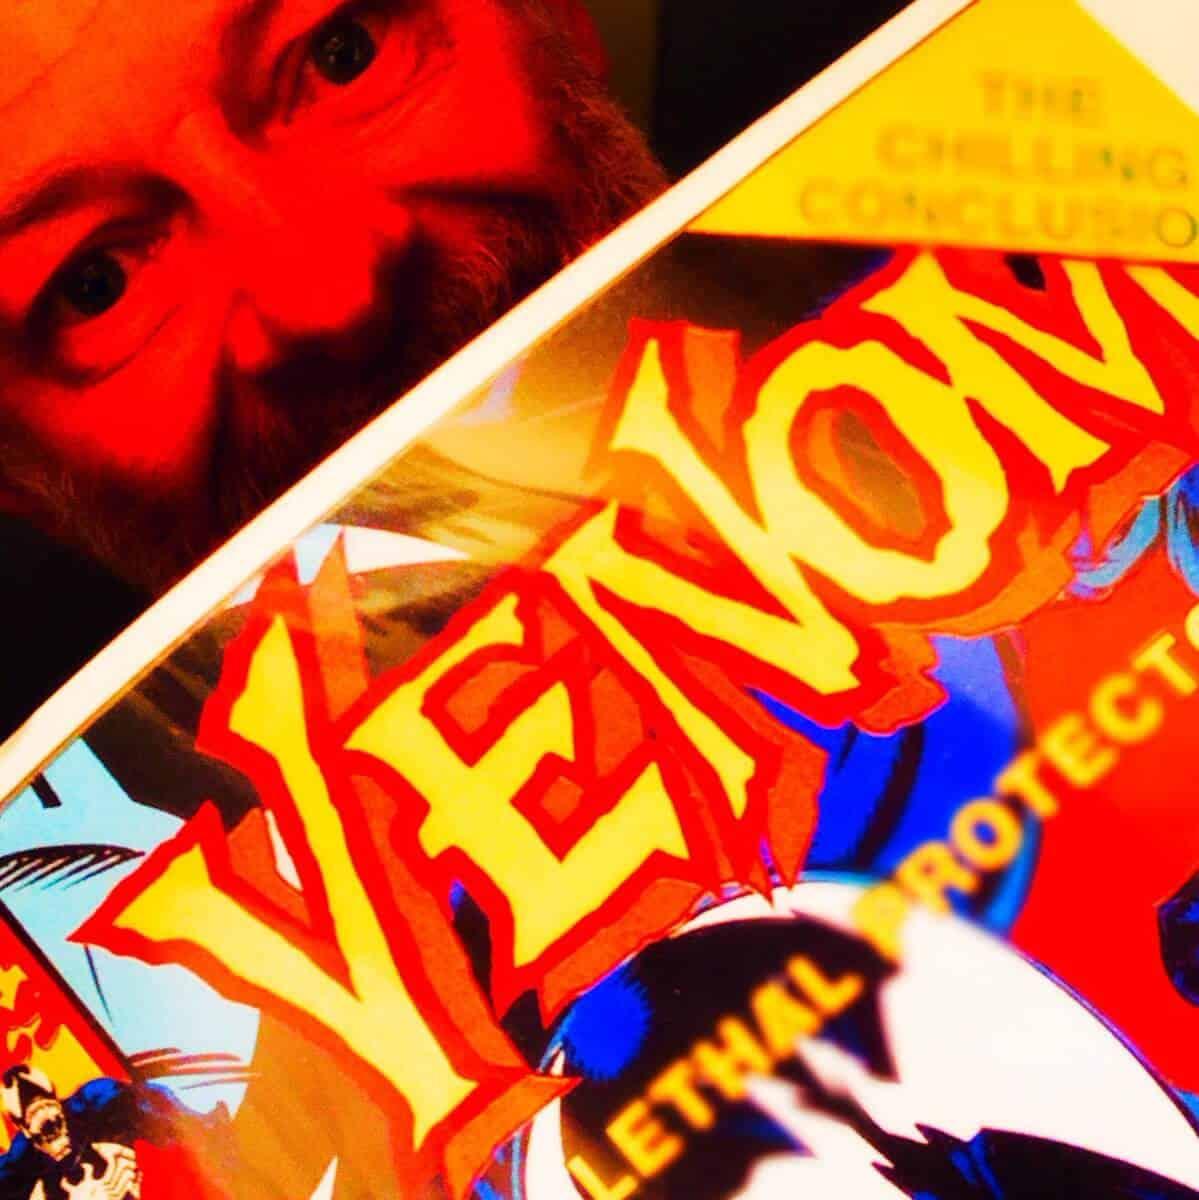 Andy Serkis Regista Venom 2